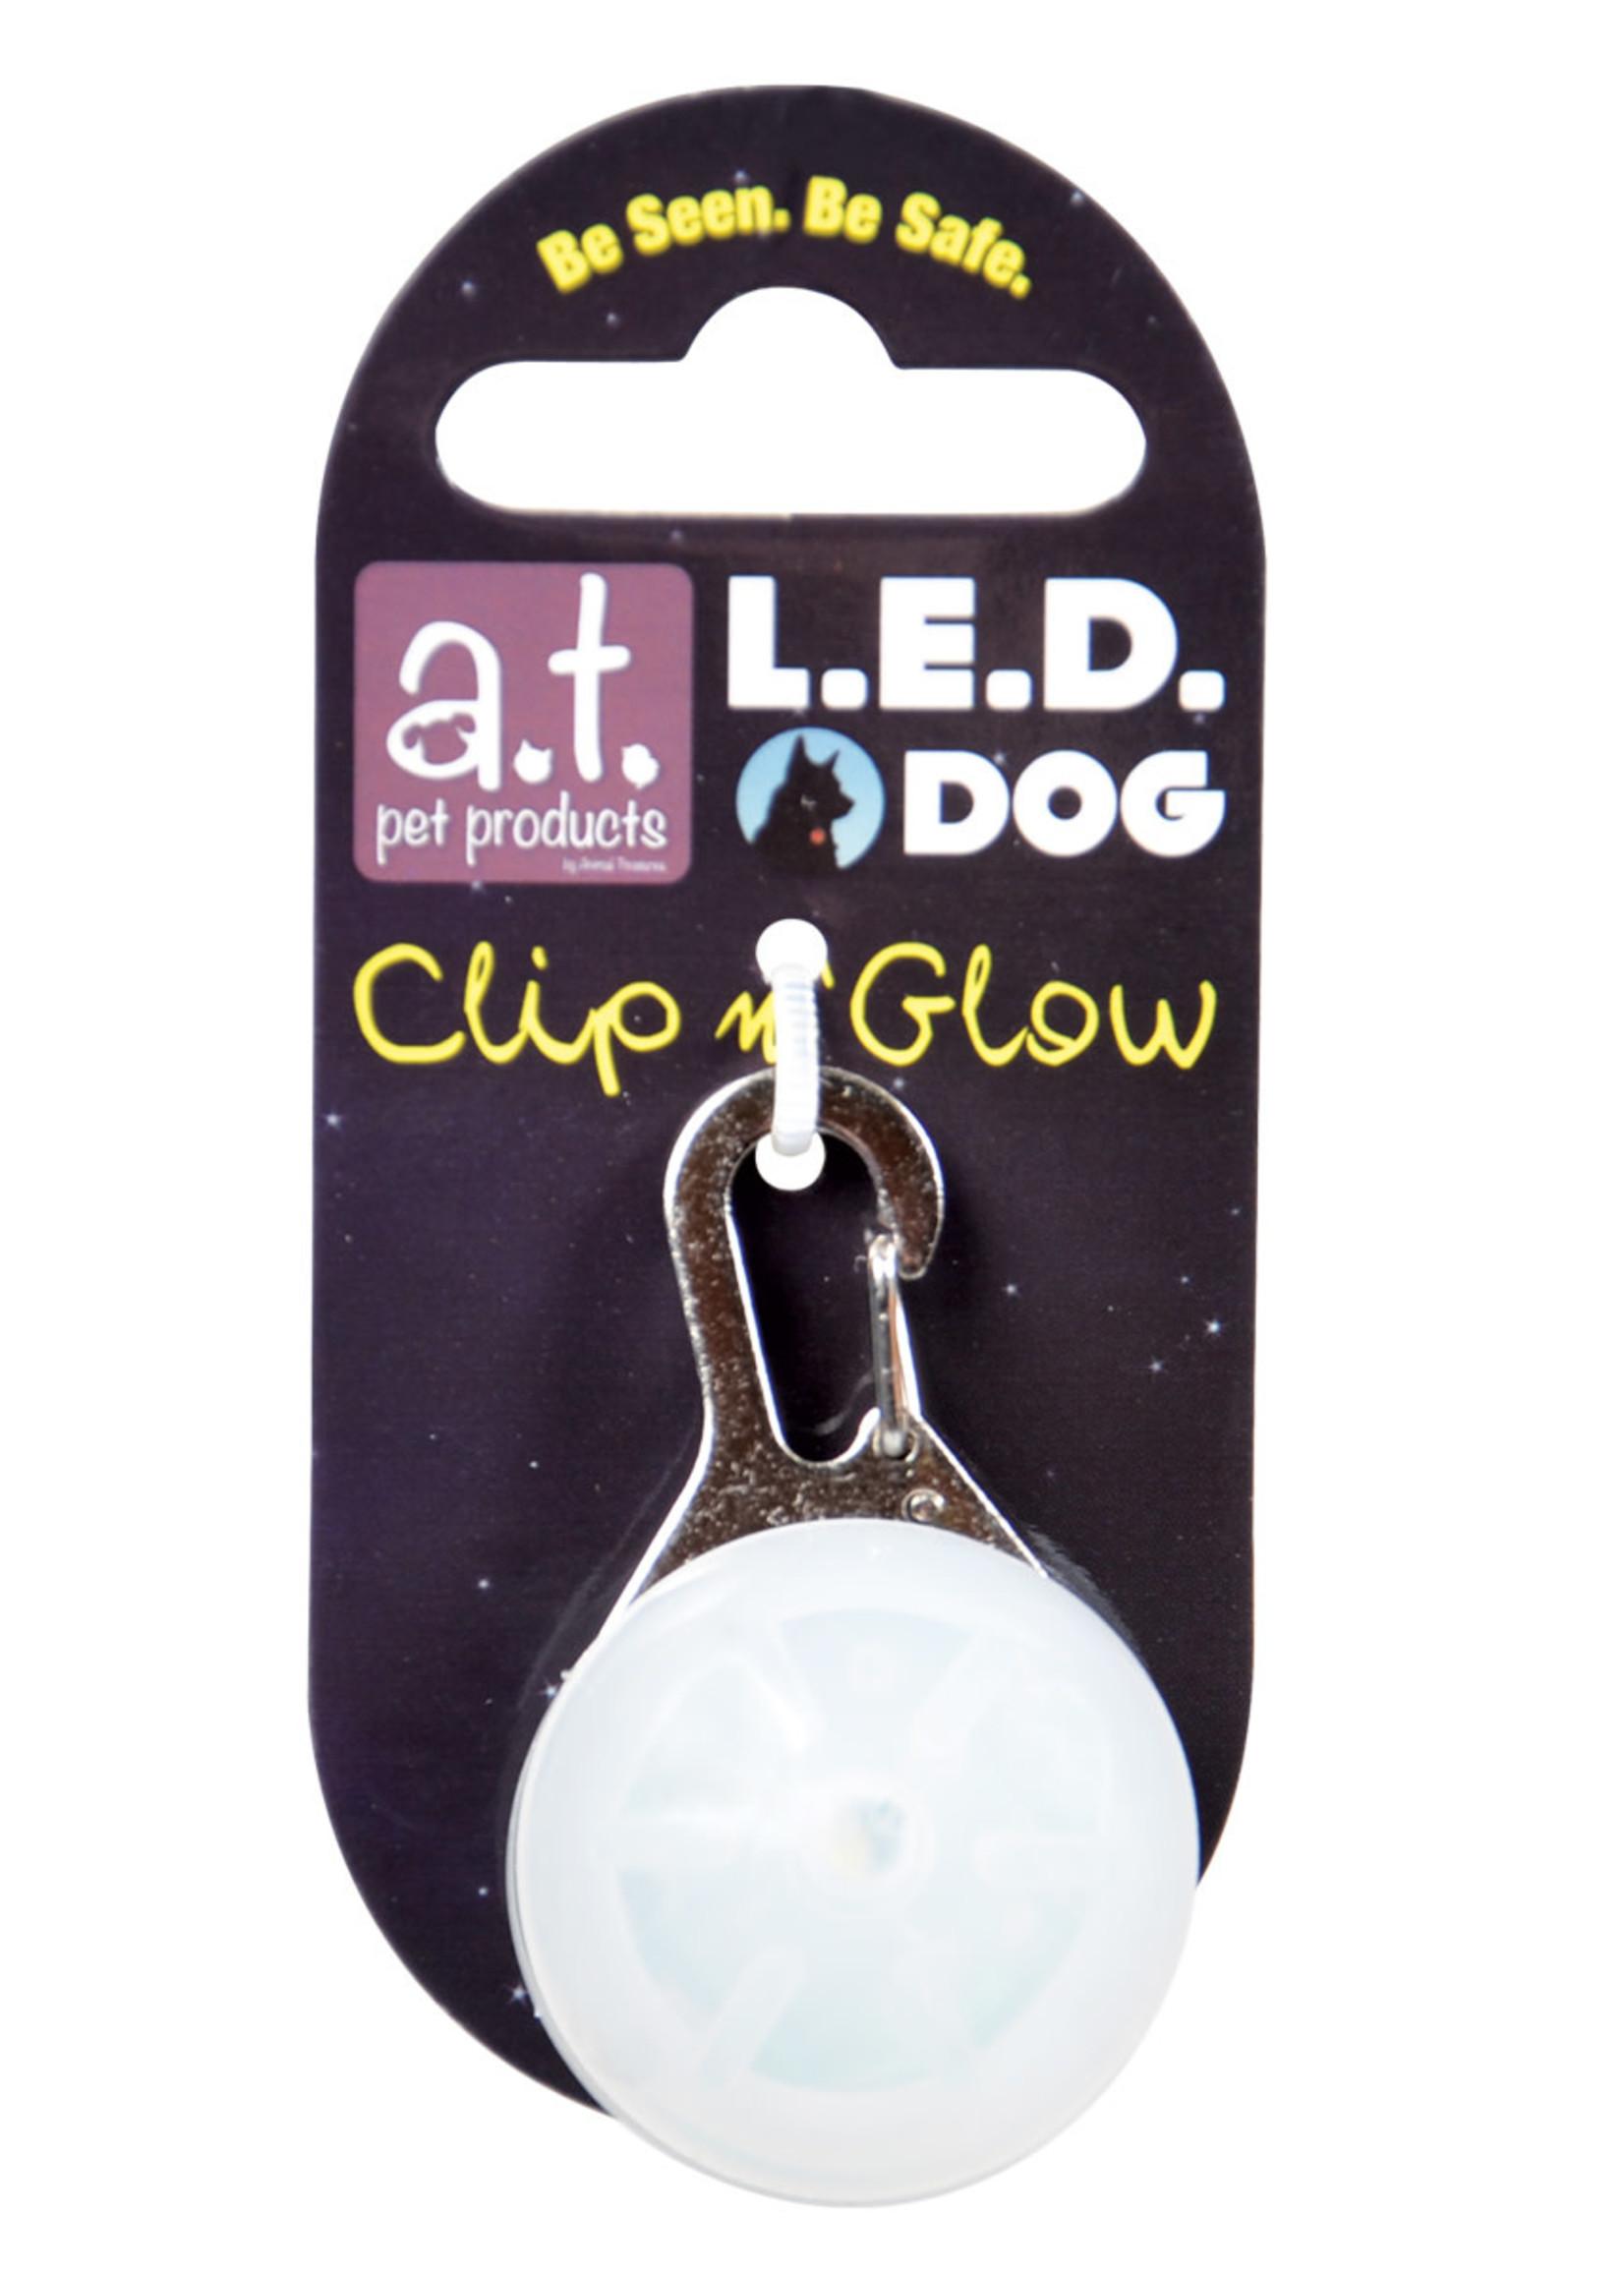 Animal Treasures Animal Treasures LED Clip n' Glow Tag - White